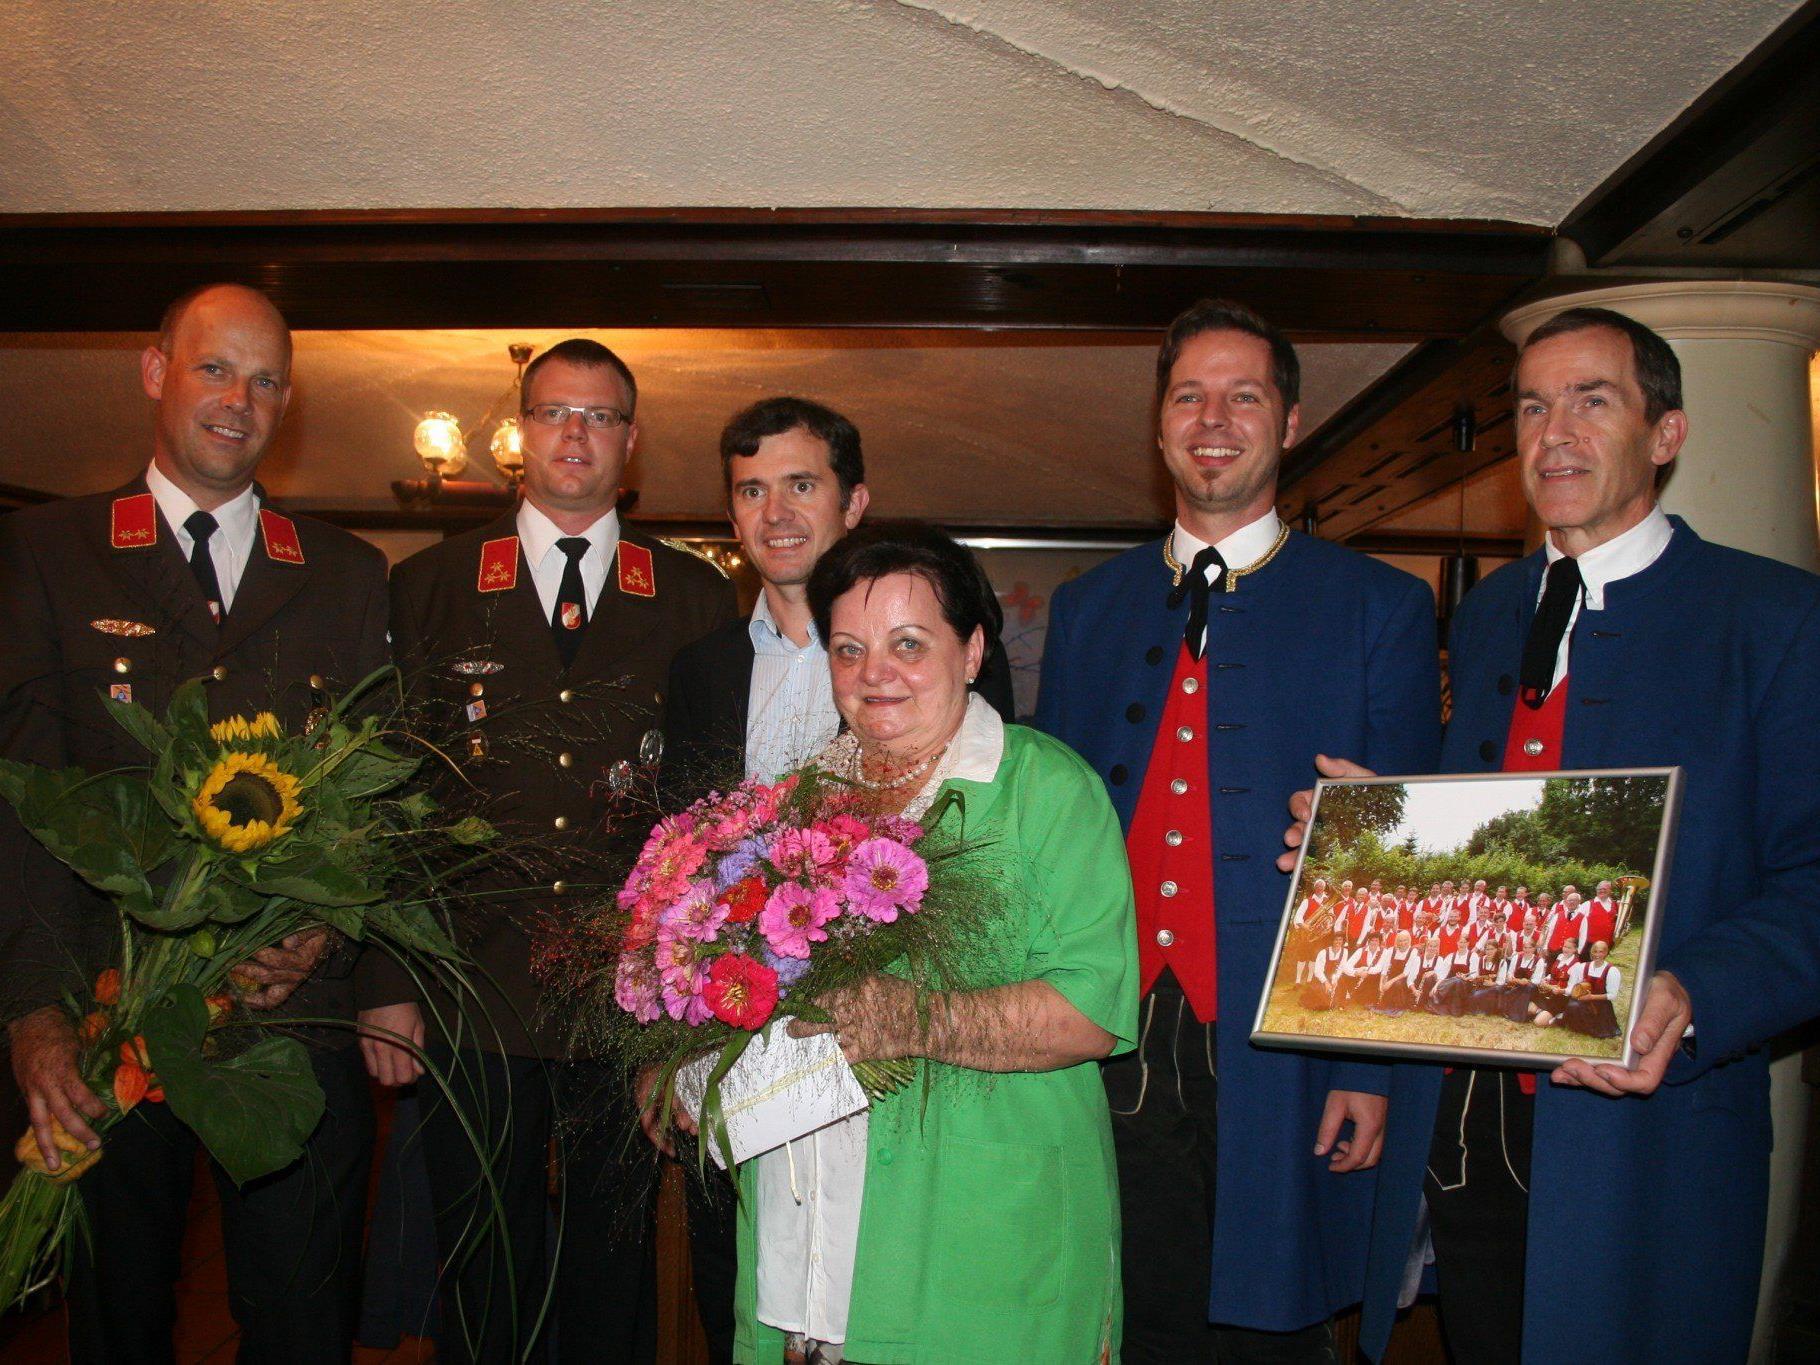 Markus Mayr (Kommandant-Stv.), Wolfgang Stöcklmair (Kommandant), Bgm. Martin Summer, Markus Summer (Kapellmeister) und Alfred Lins (Obmann) mit Martha Fulterer.